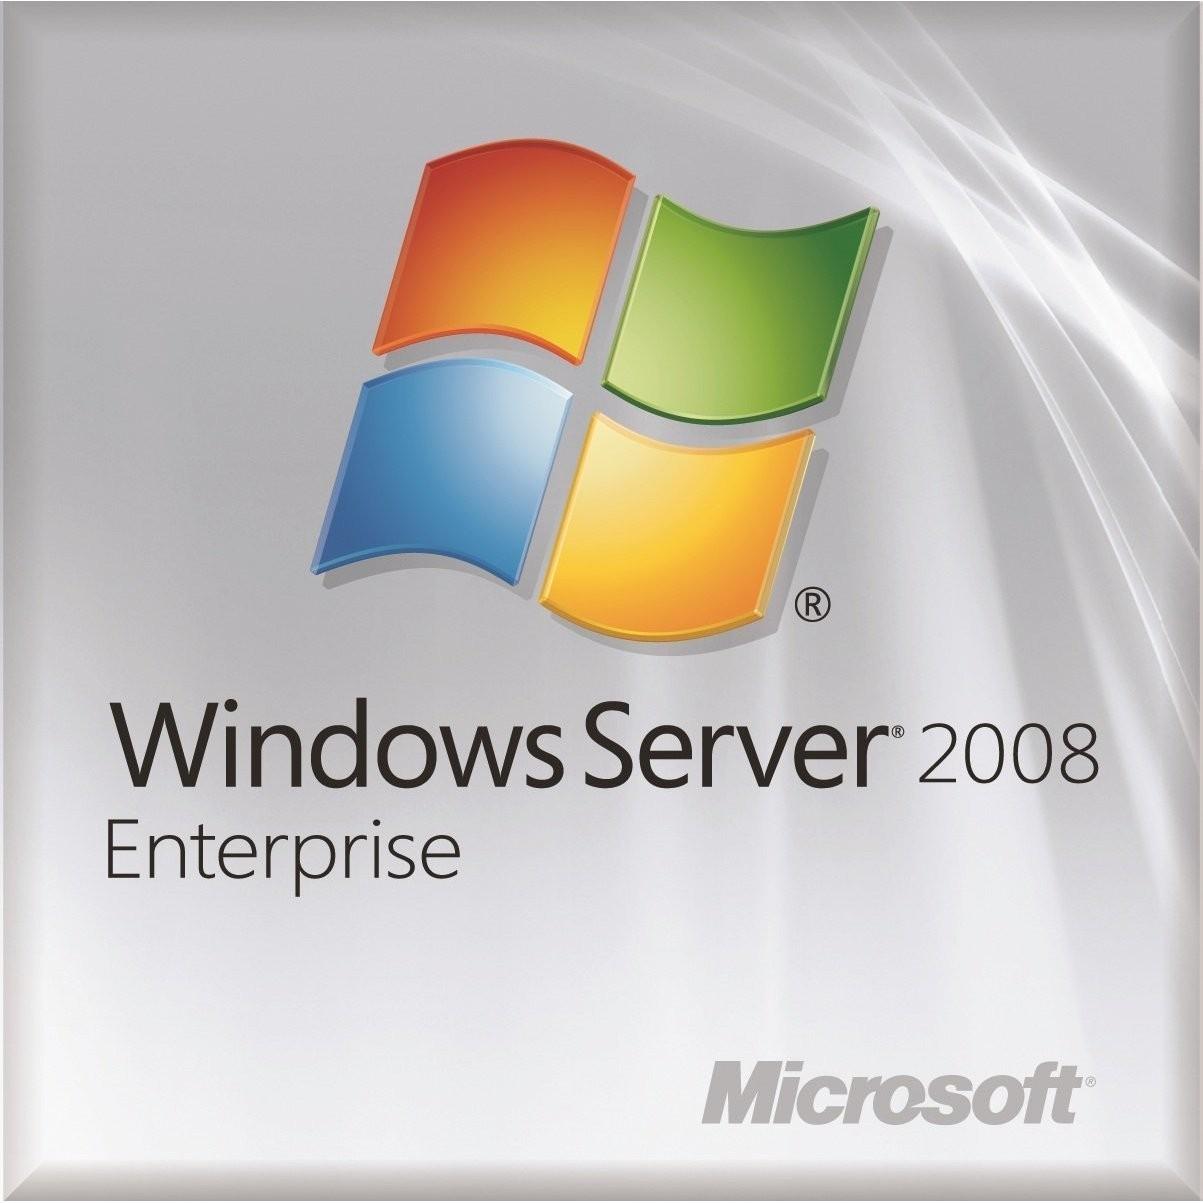 Koniec podpory windows Server 2008 Enterpise